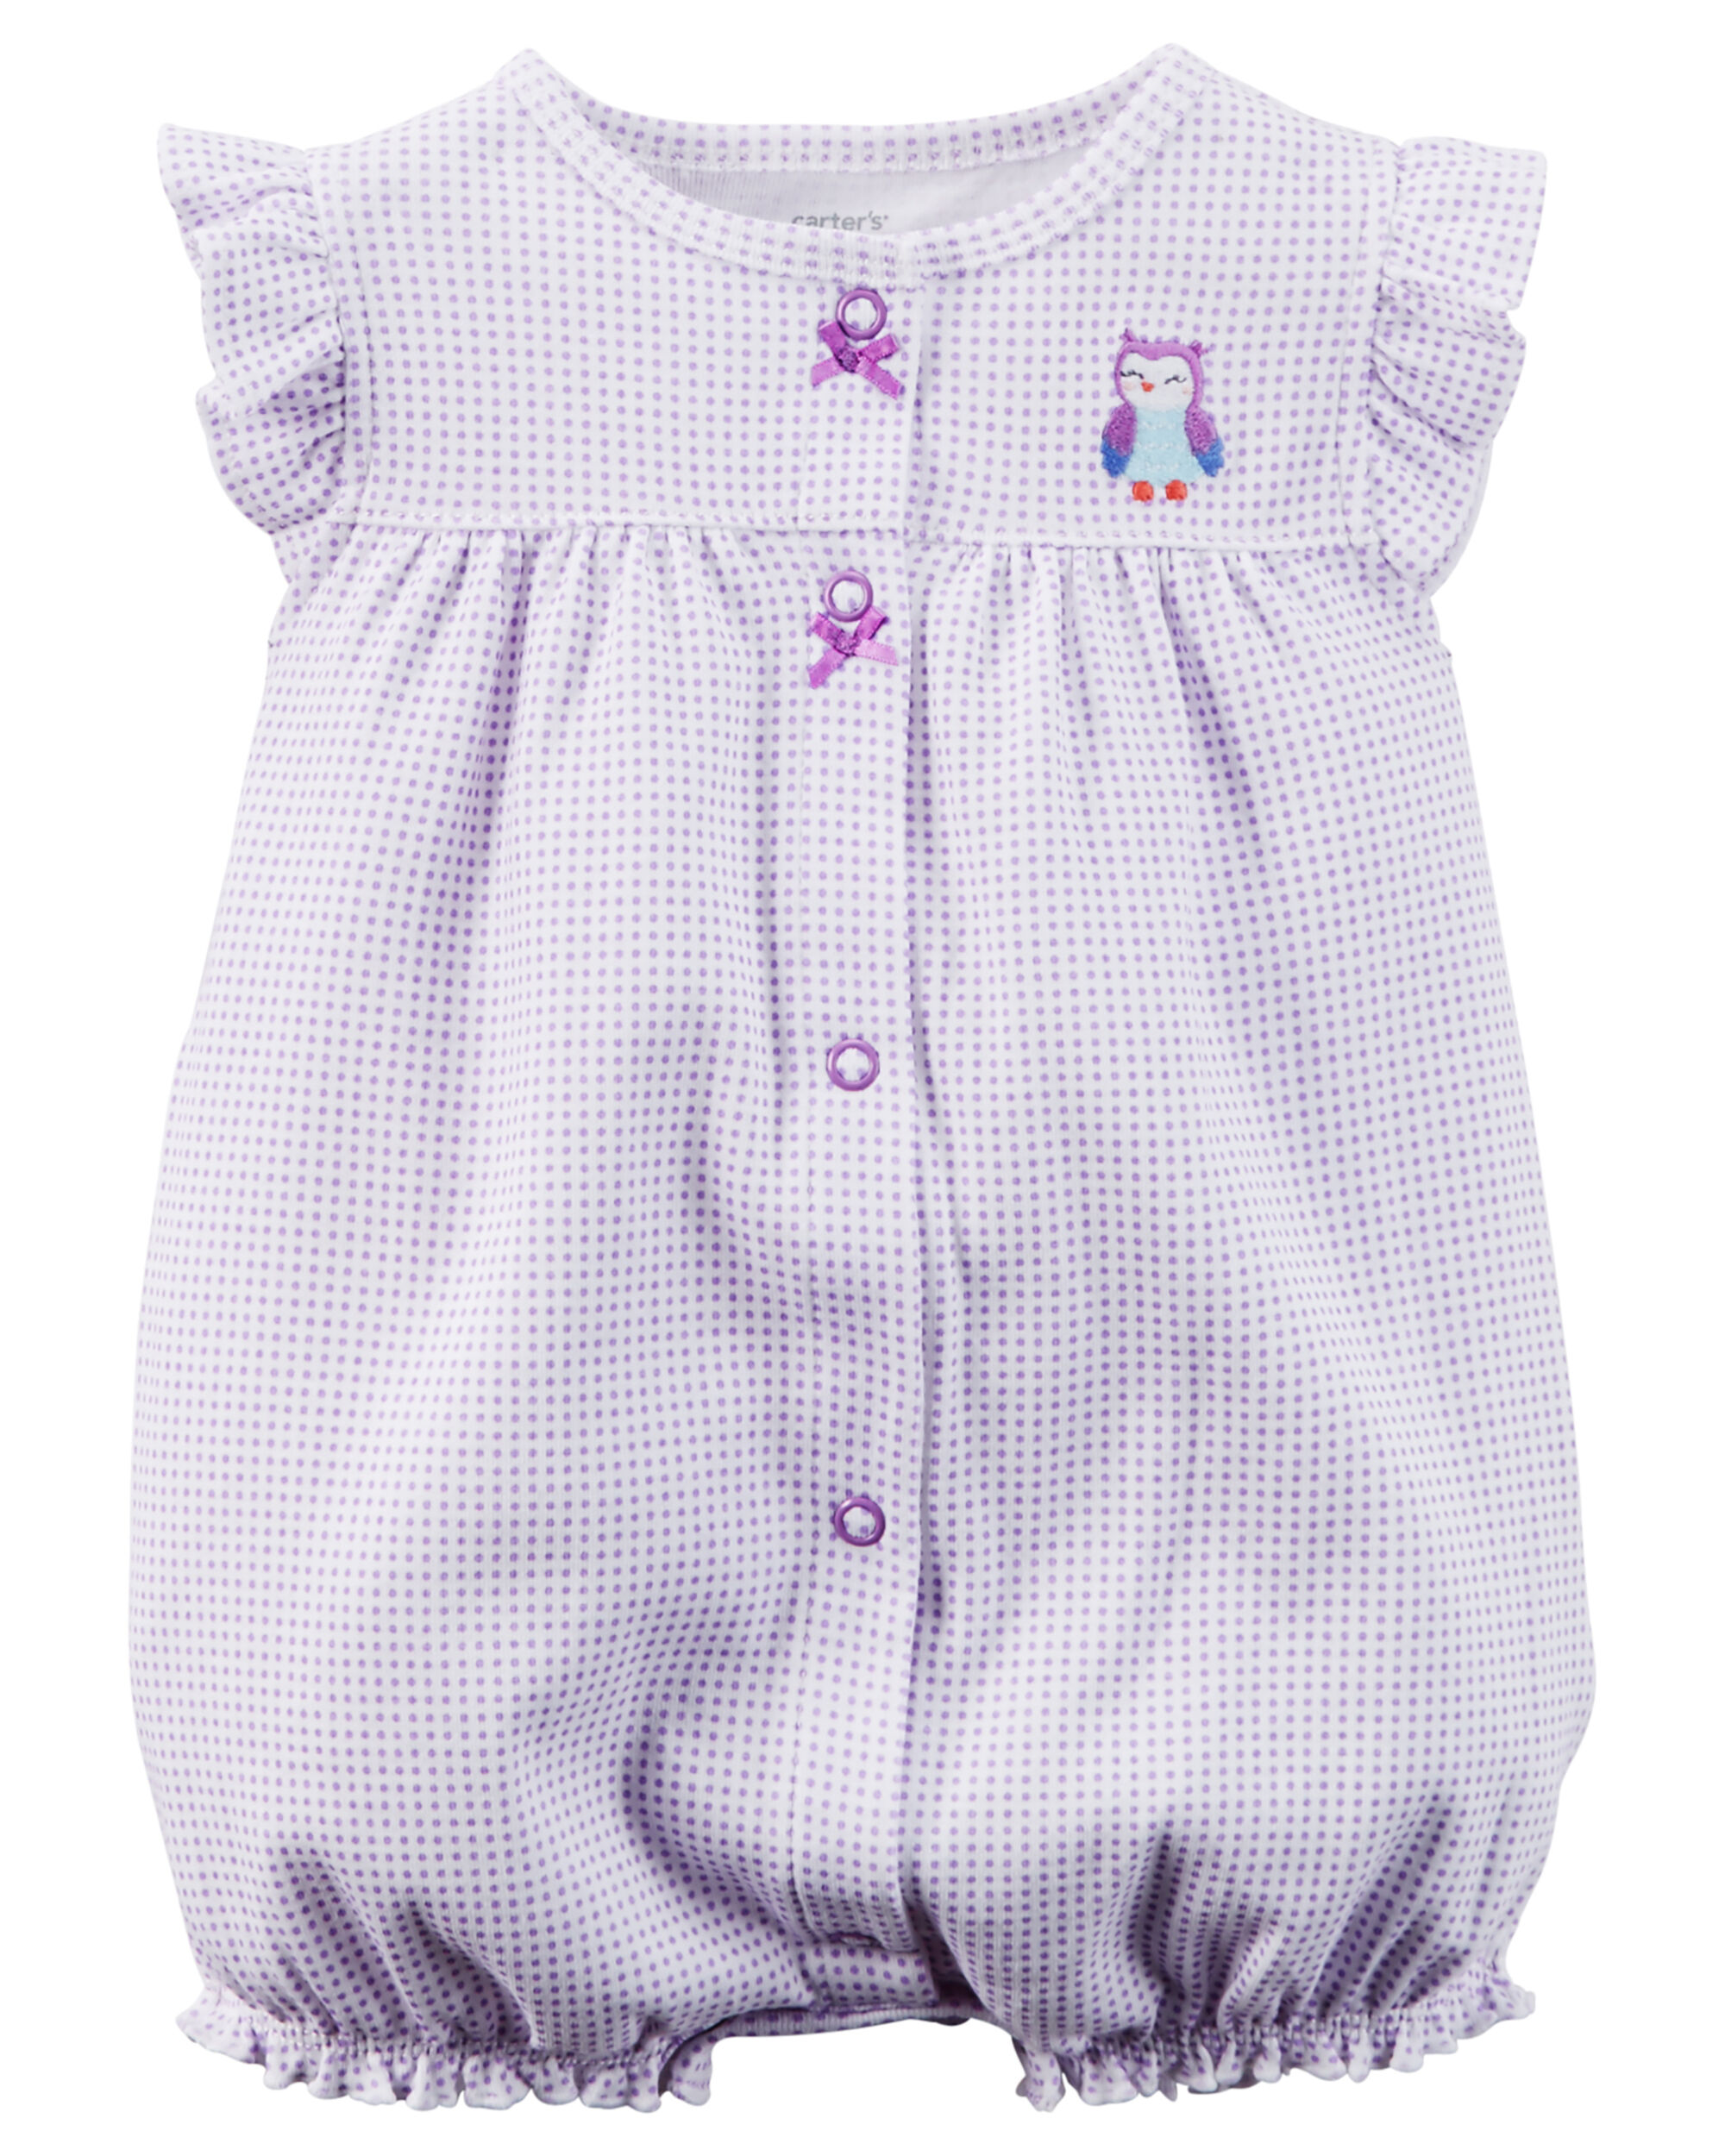 Baby Girl Snap Up Appliqué Cotton Romper